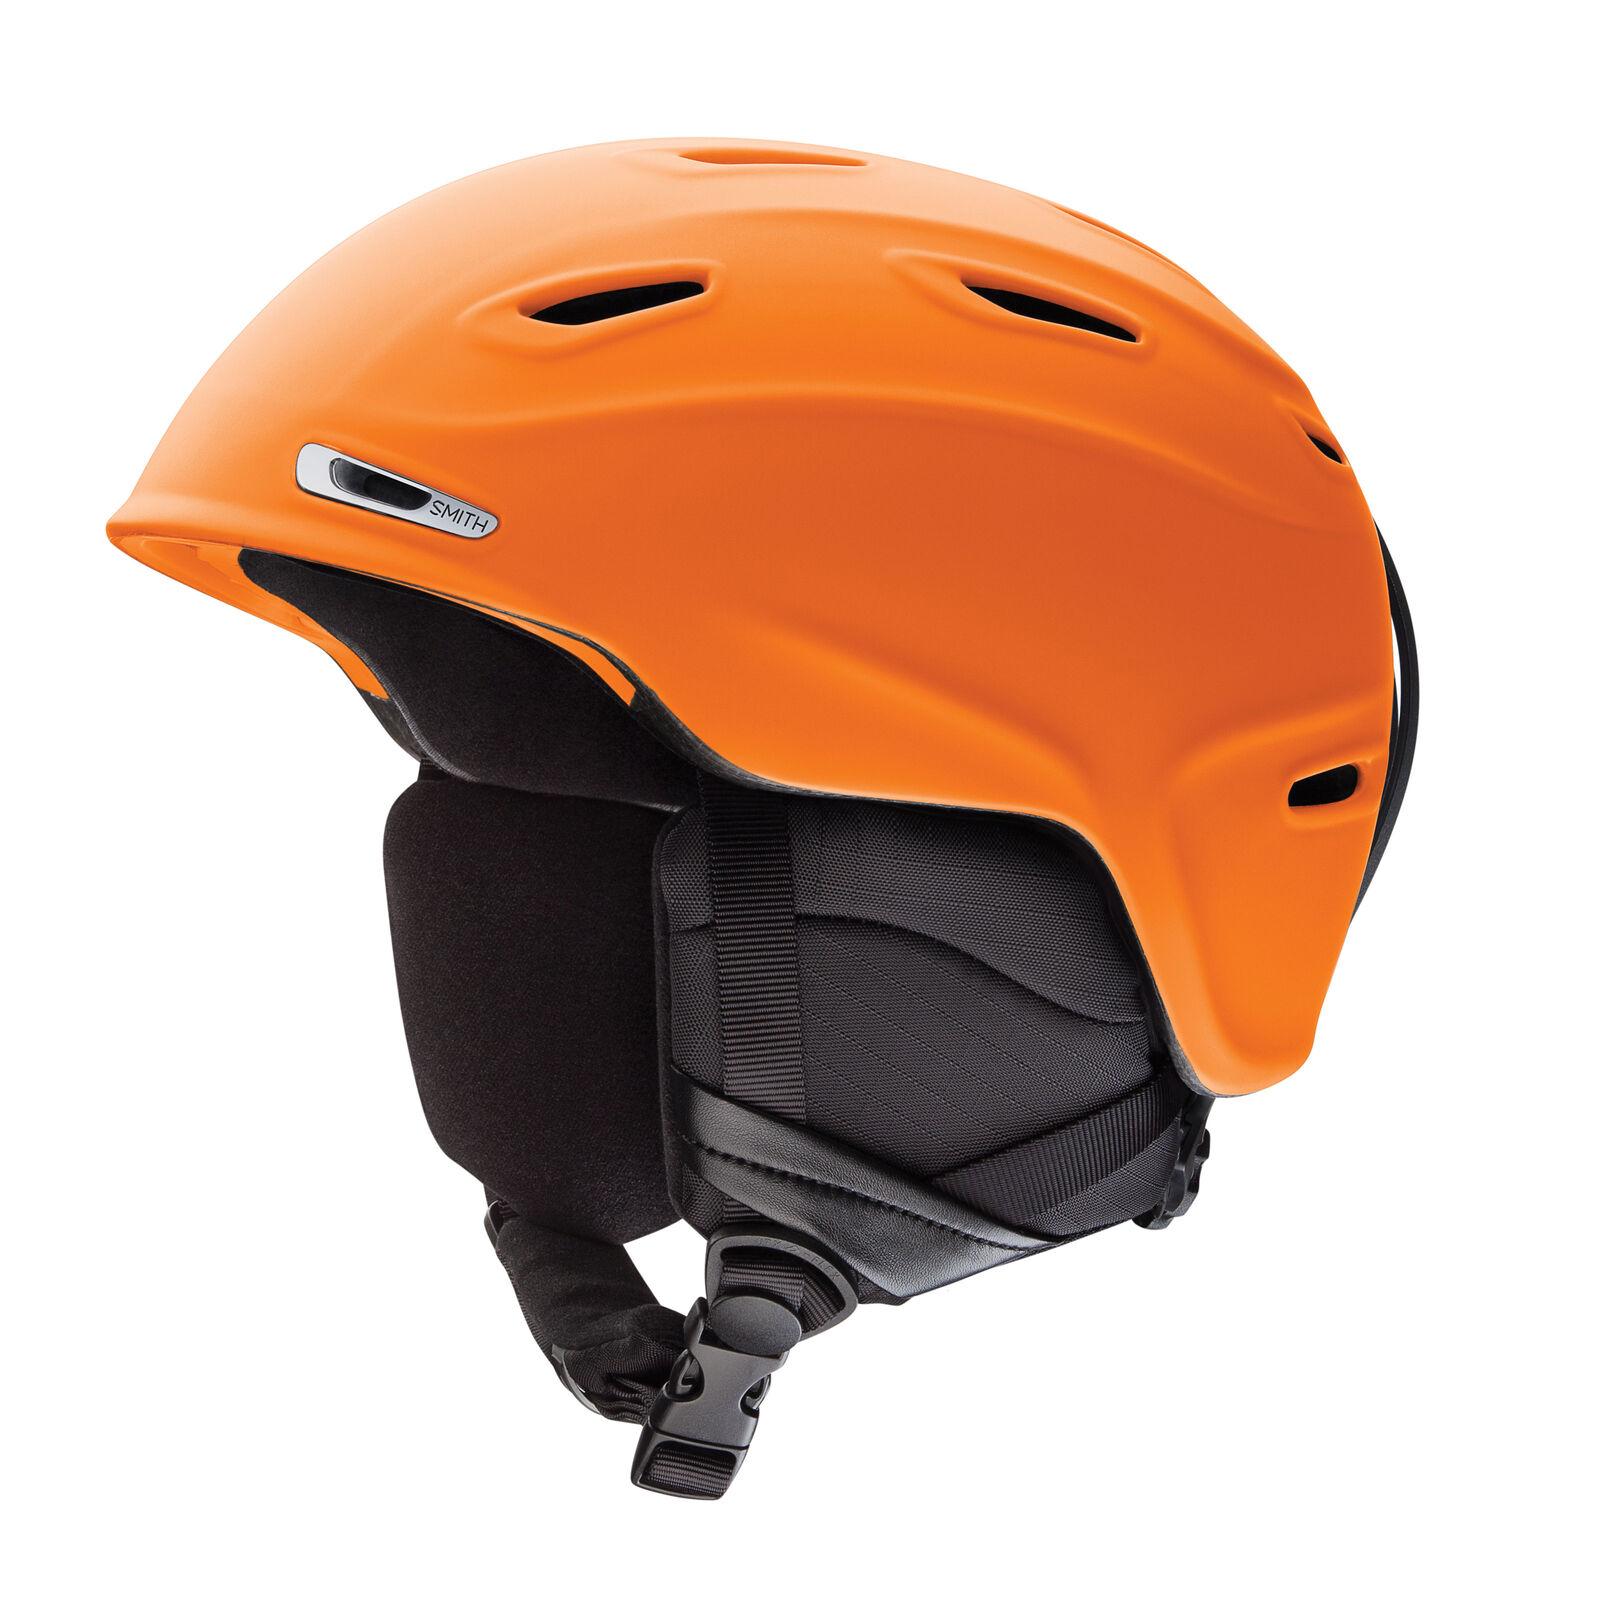 Smith Ski Helmet Snowboard Helmet Aspect orange Light Plain Colour Ventilation